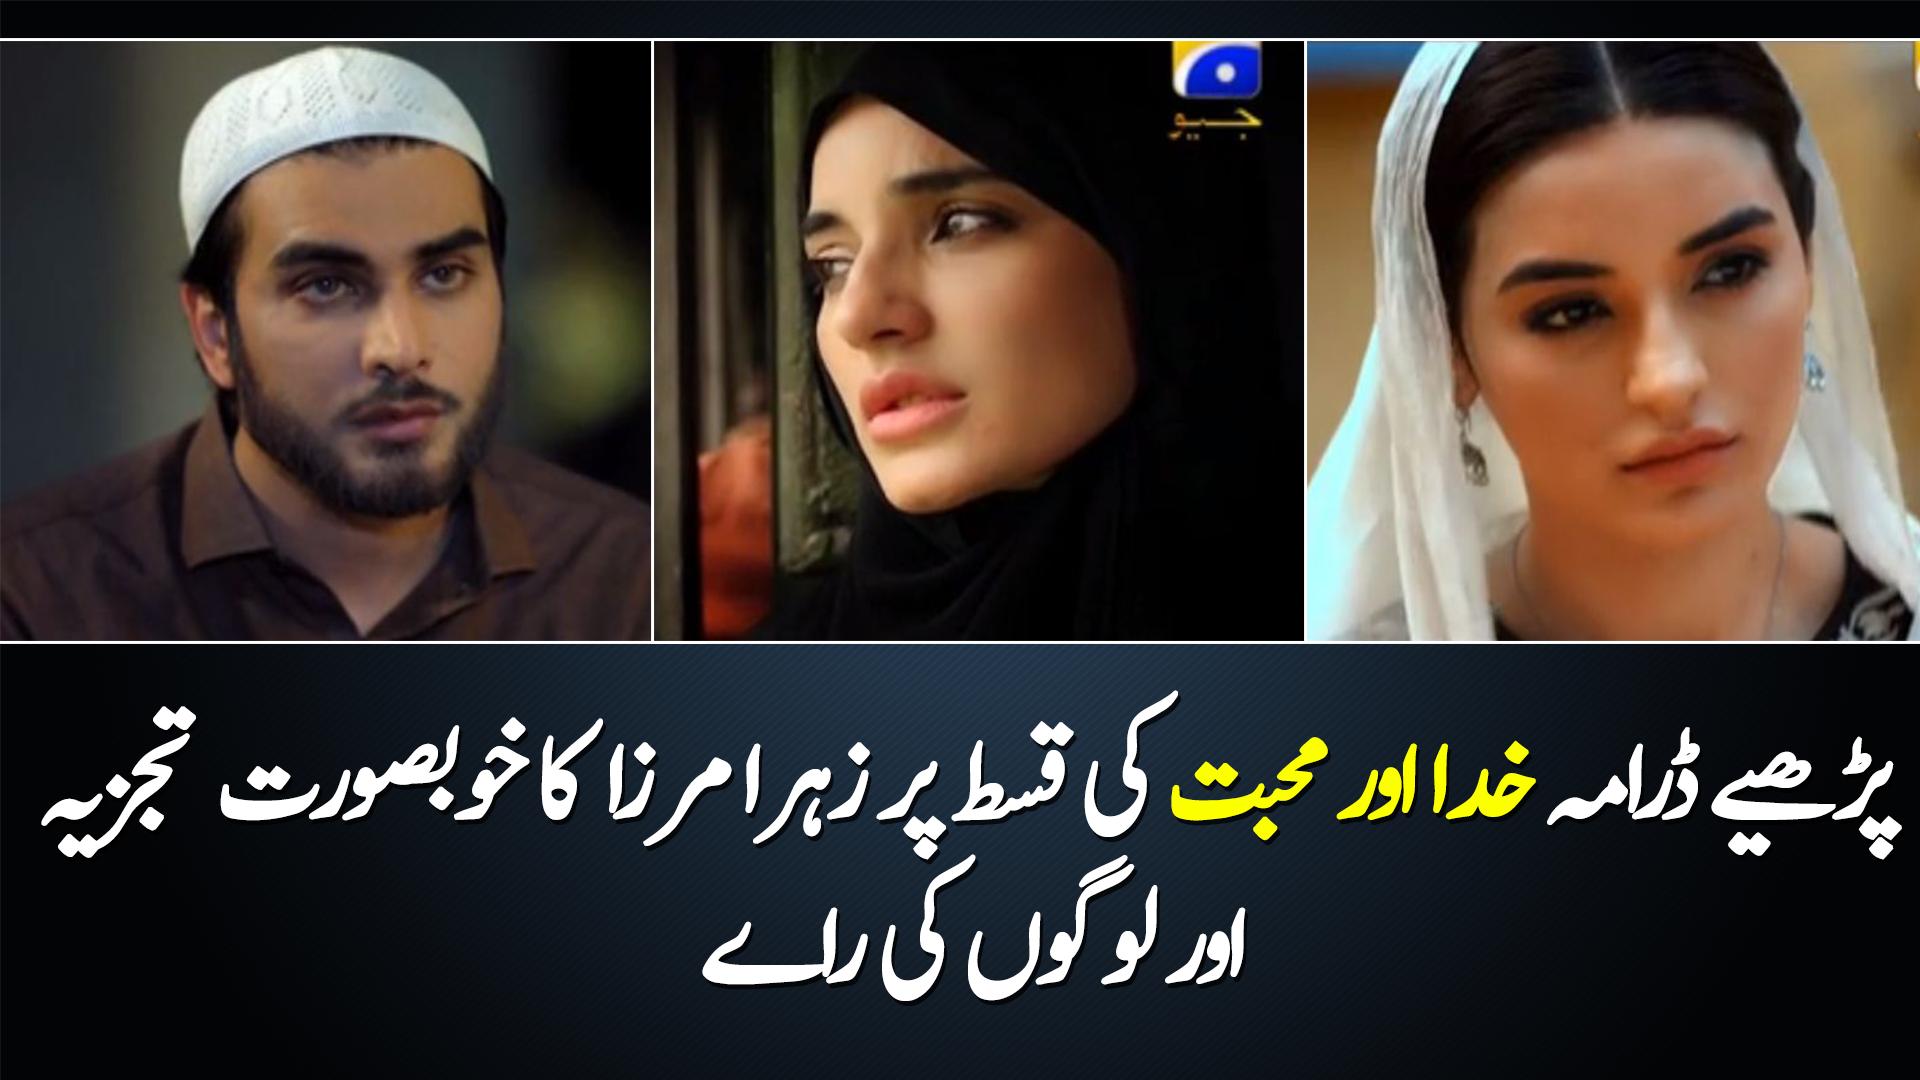 khuda aur mohabbat episode review journey discovery begins reviewitpk